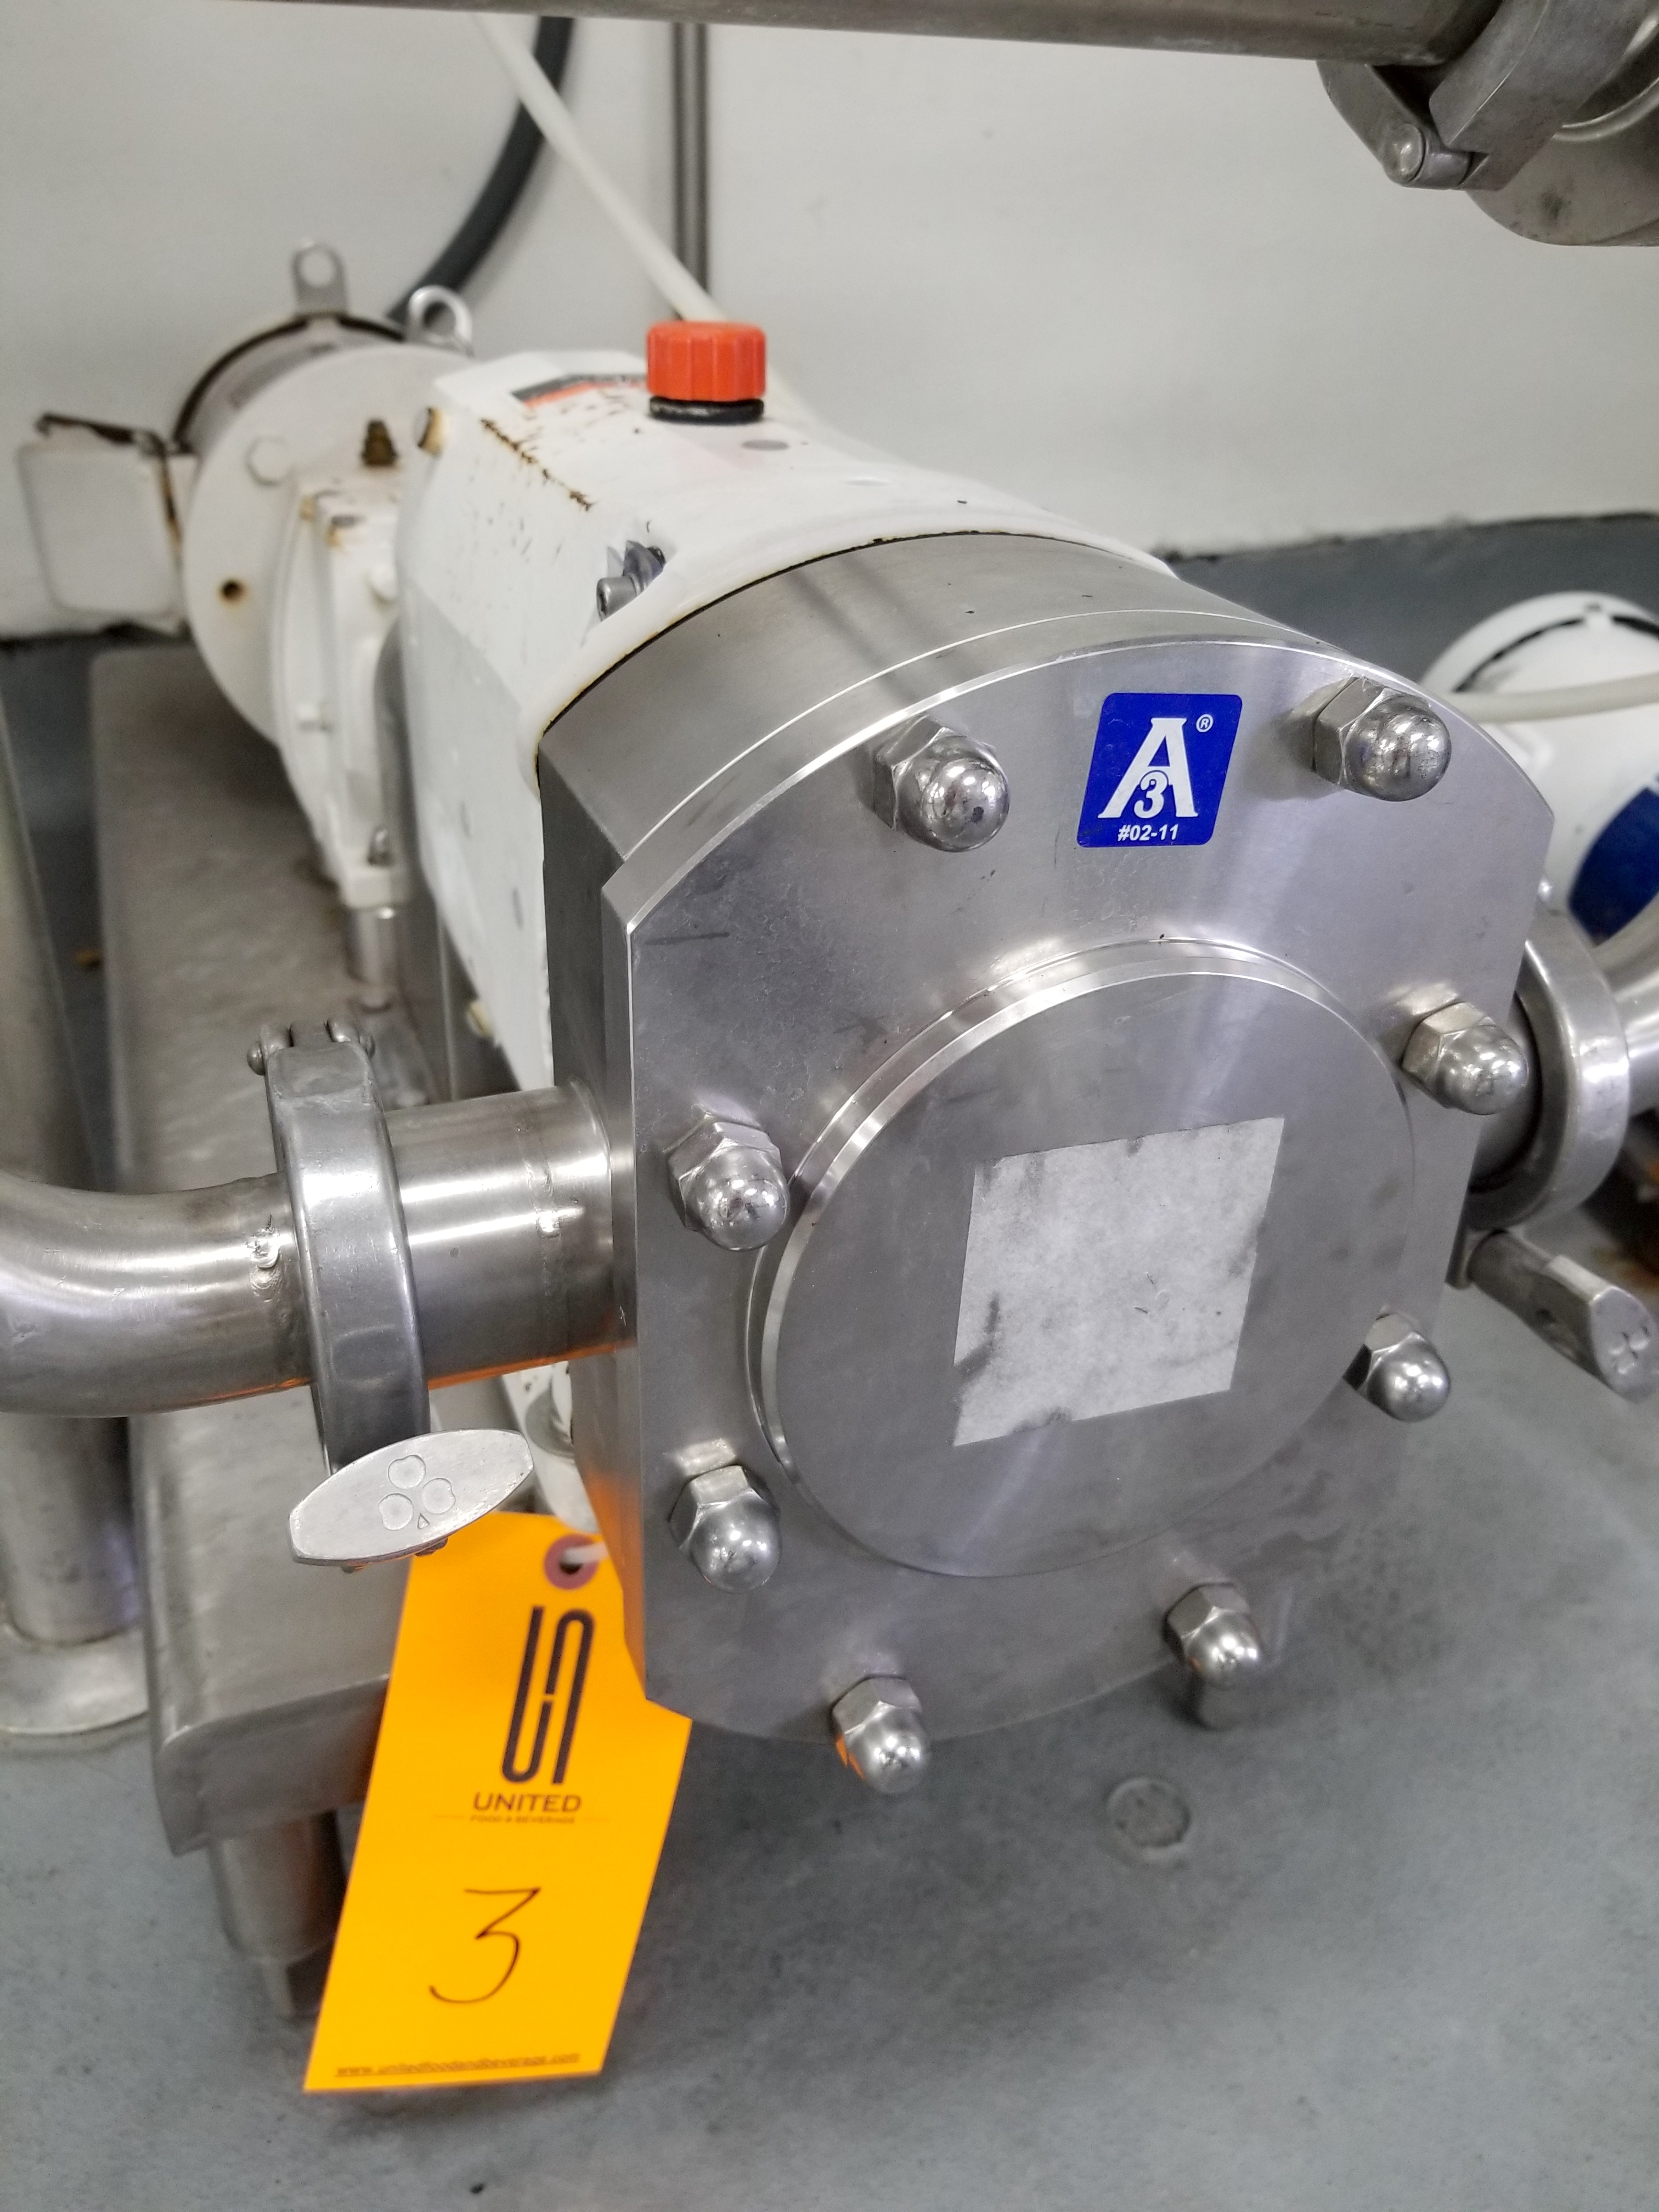 2015 Alfa Laval Positive Displacement Pump - Image 3 of 6